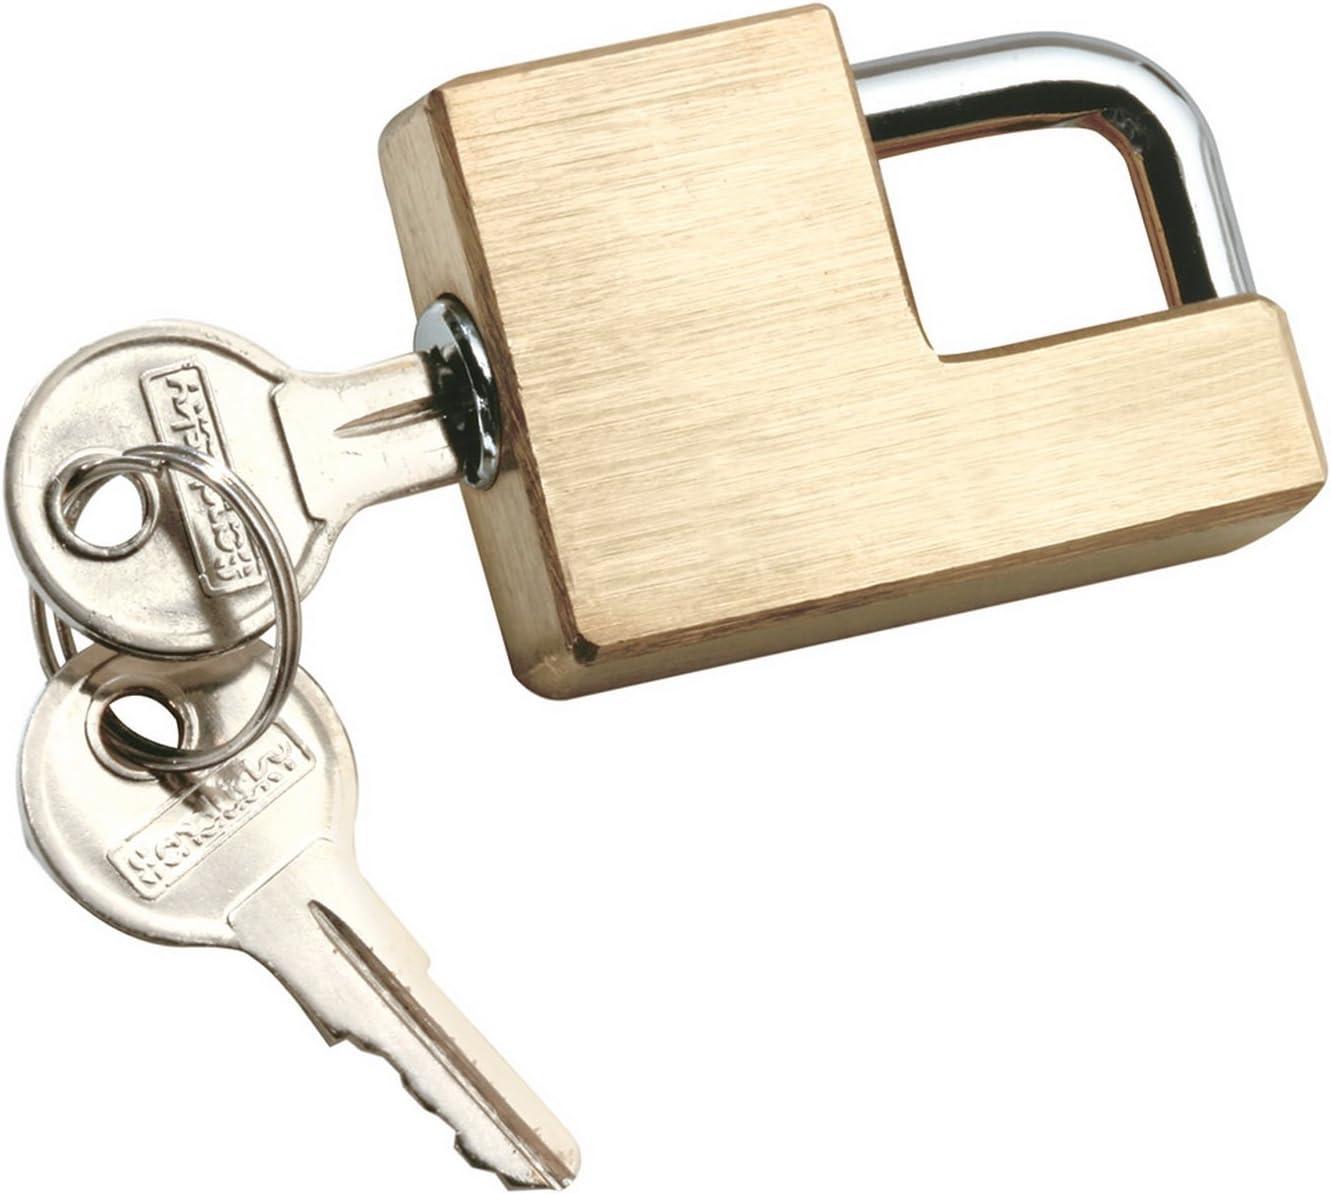 2021 Philadelphia Mall new Reese Towpower 7005300 Brass Lock Coupler